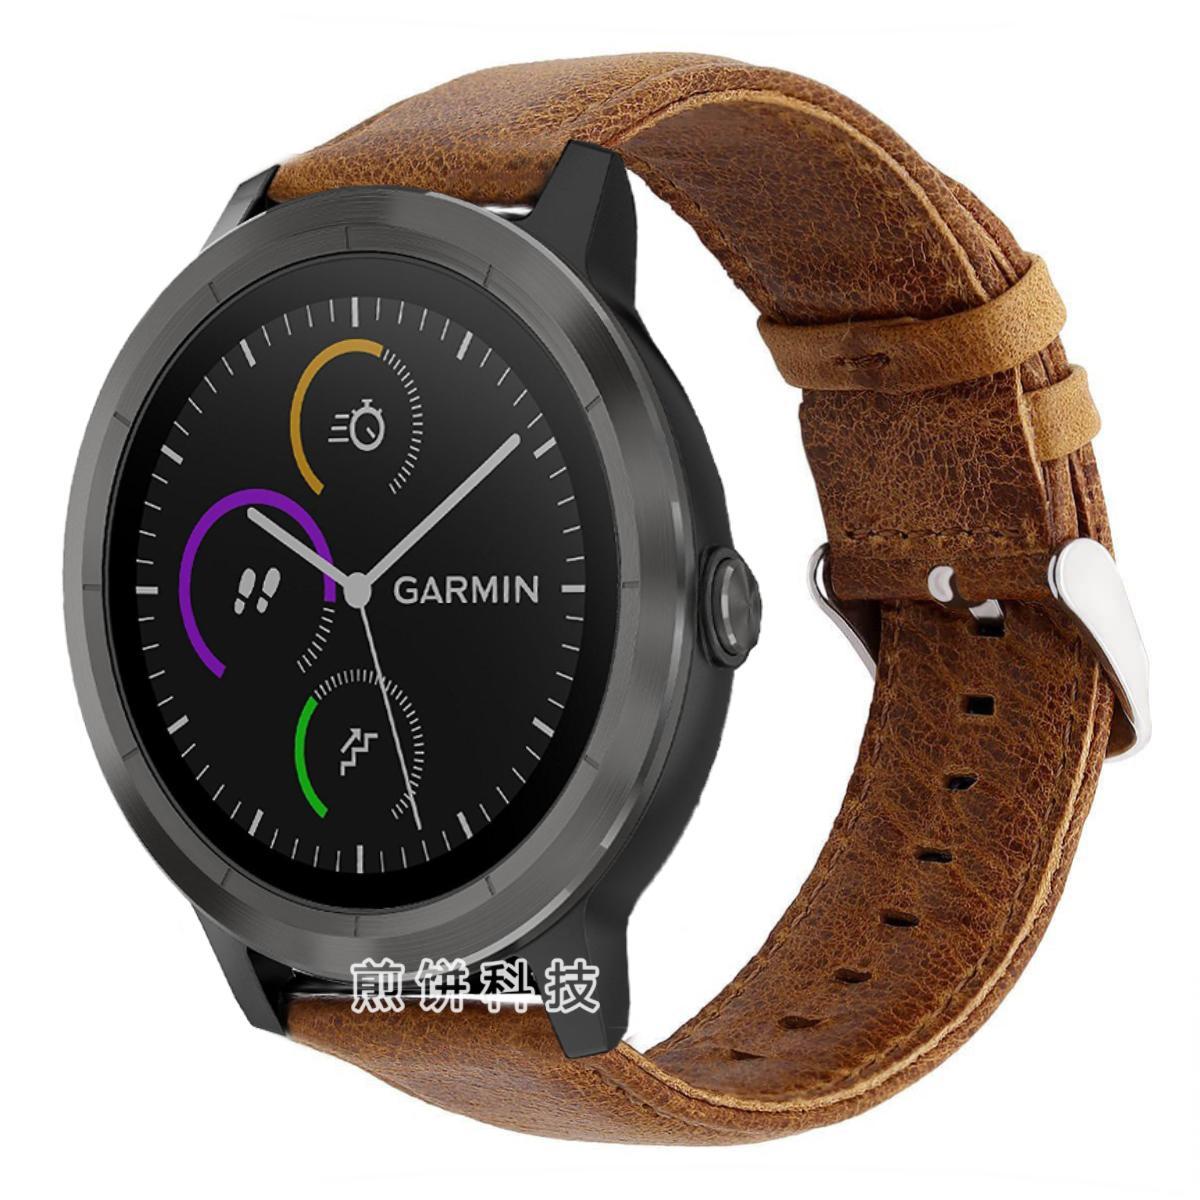 Garmin garmin Vivoactive 3 Music Music Edition Jam Tangan Crazy Horse pola Tali jam tangan Baur